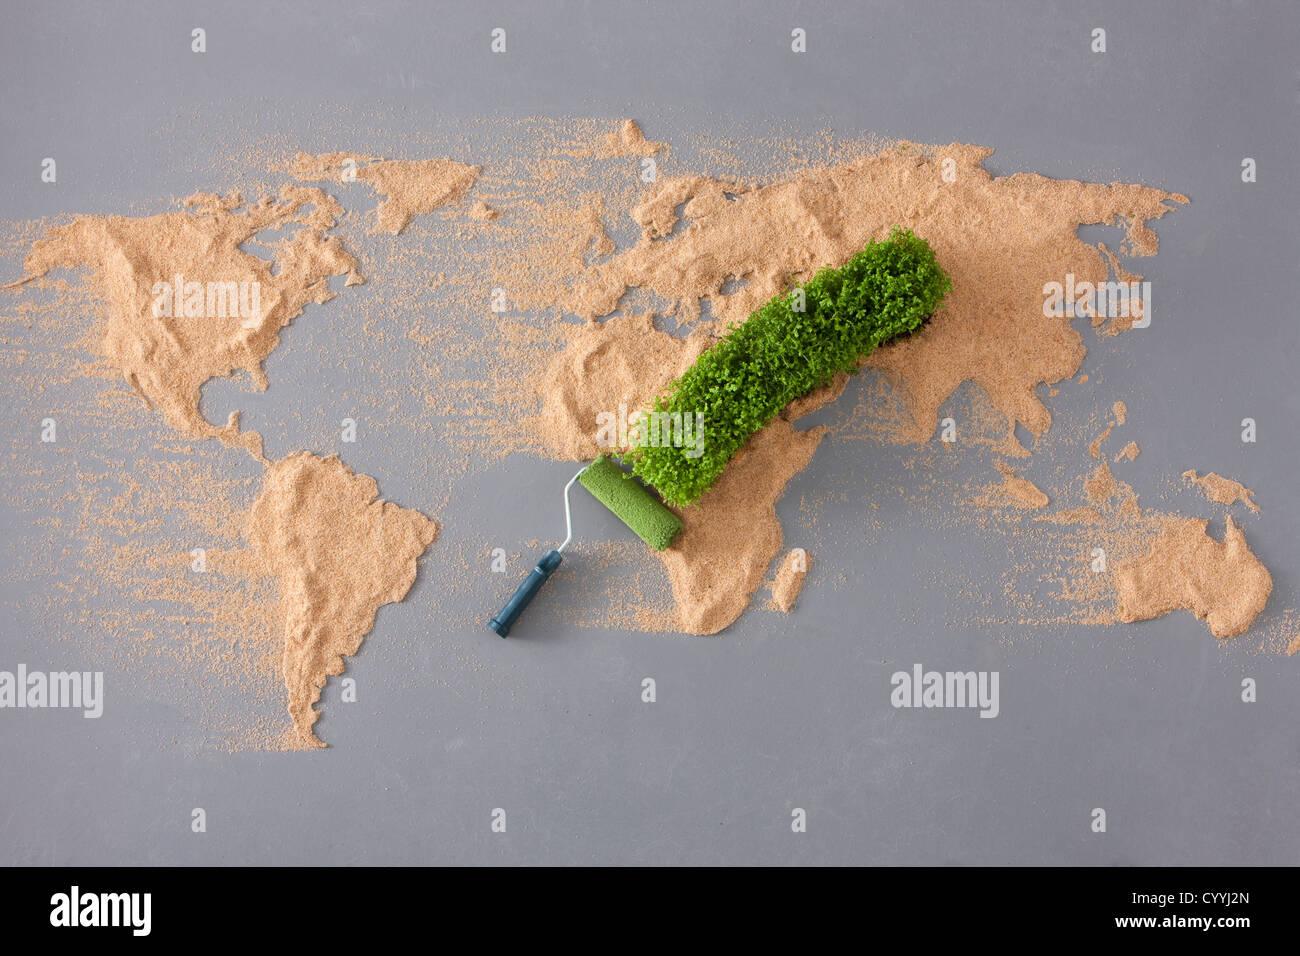 Creative world map stock photo 51623341 alamy creative world map gumiabroncs Choice Image